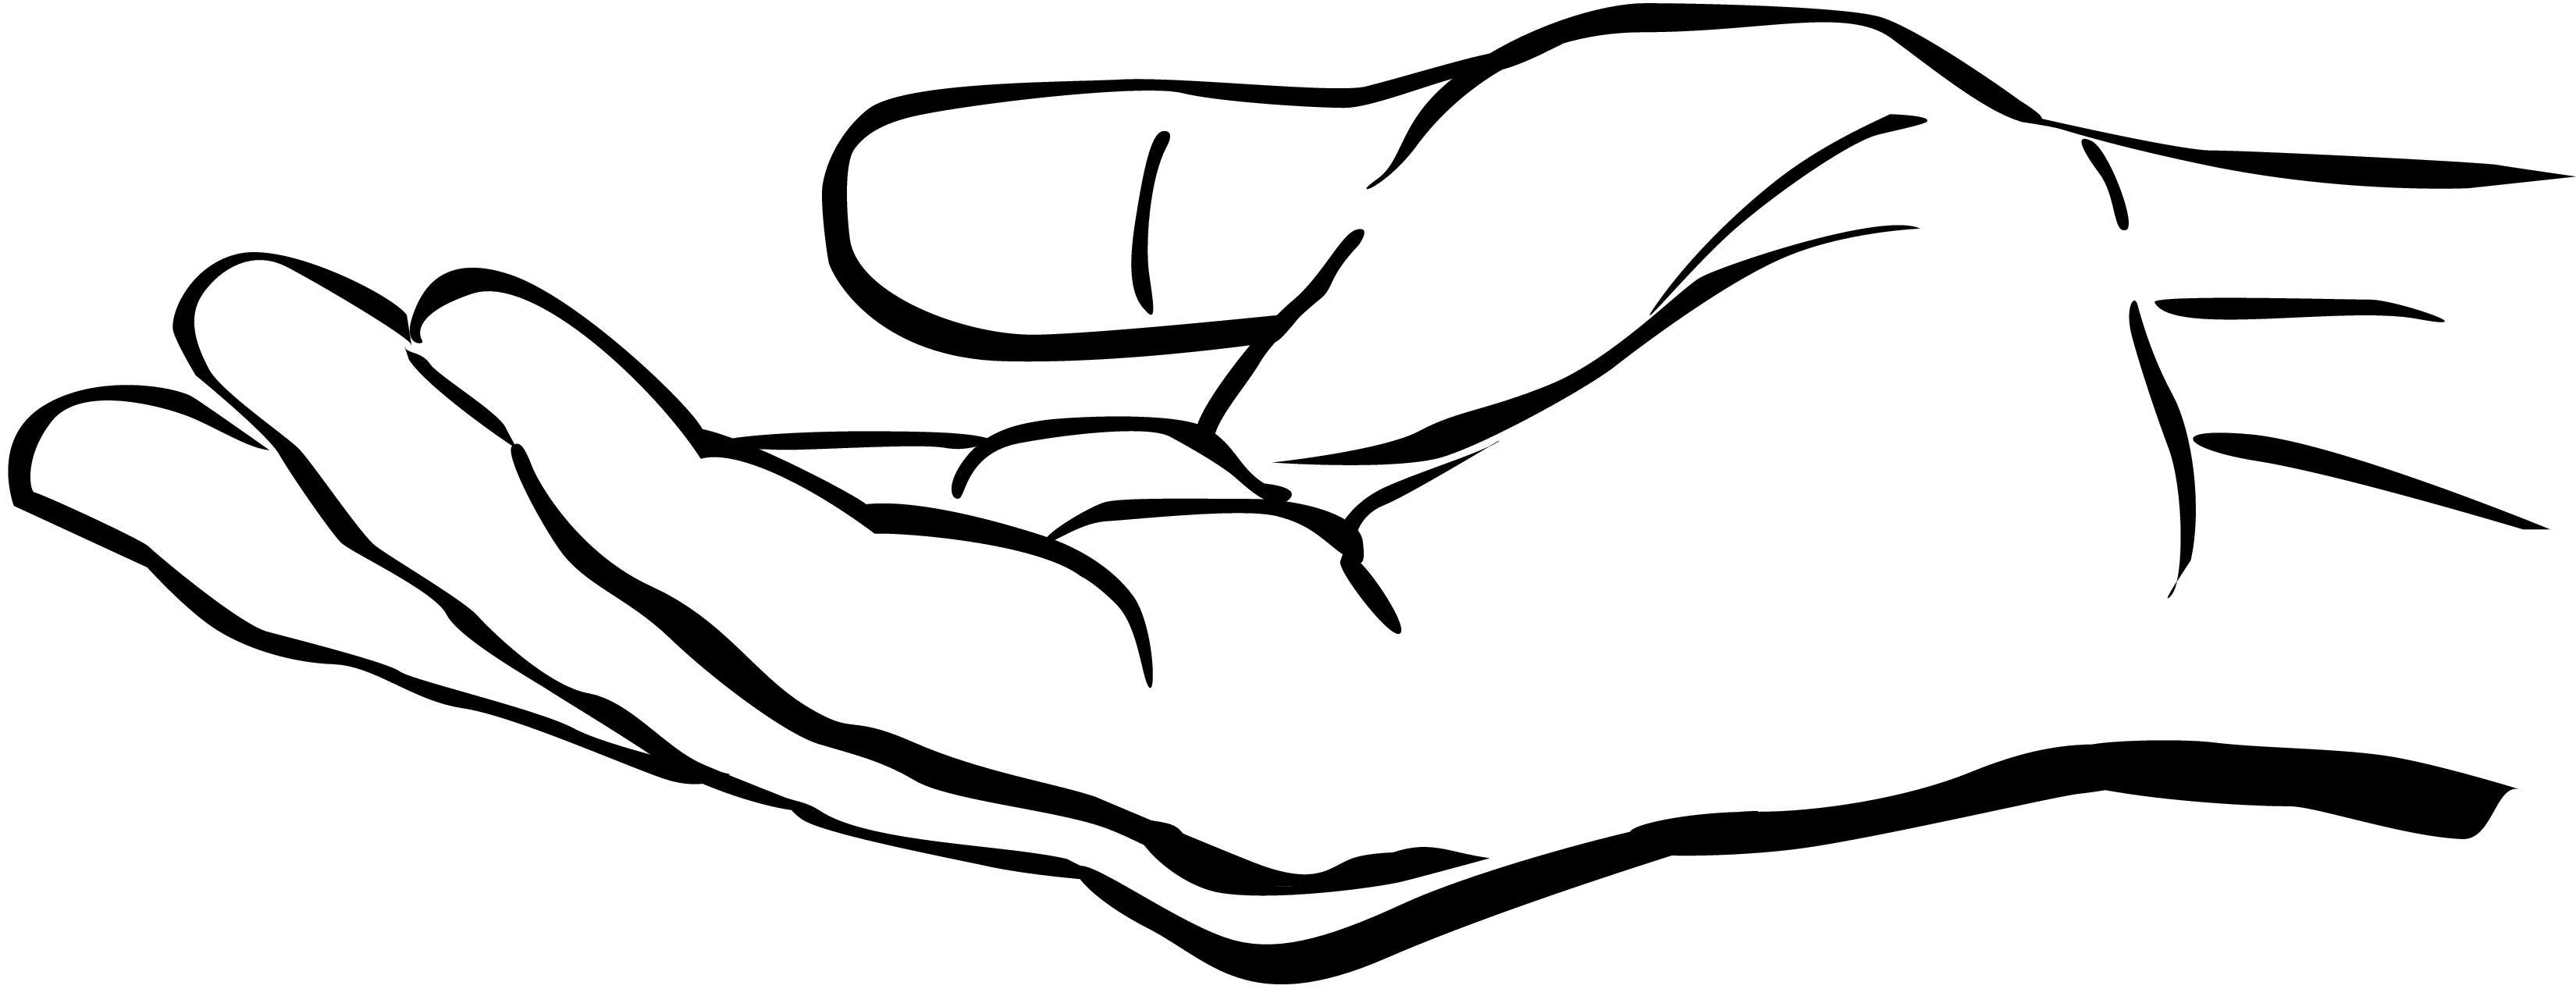 Prayer Hands Outline